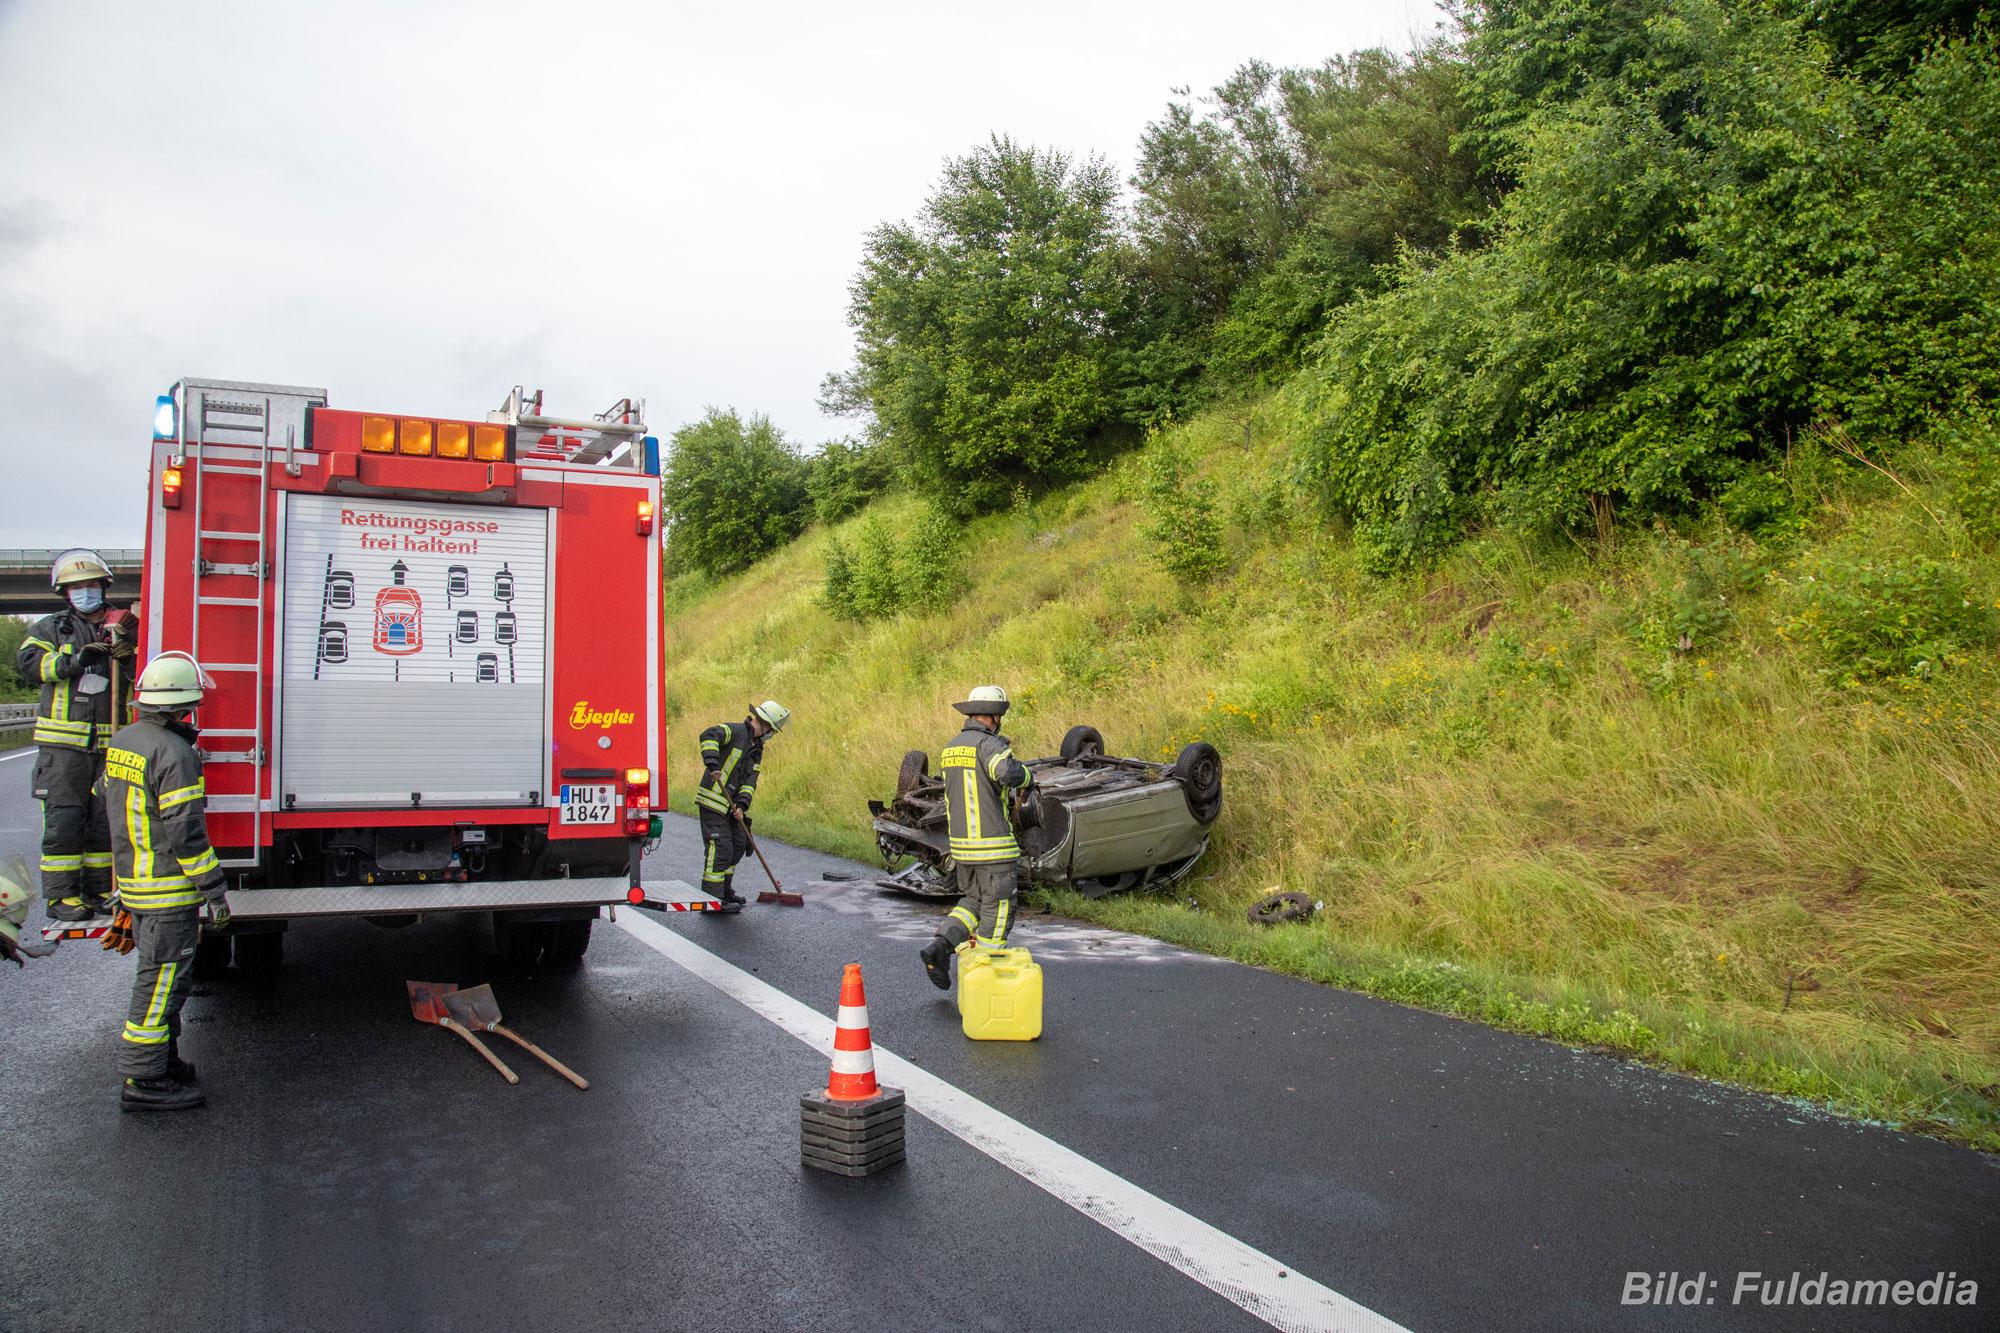 2021-63: 04.07.2021 19:32 Uhr – Verkehrsunfall auf Autobahn